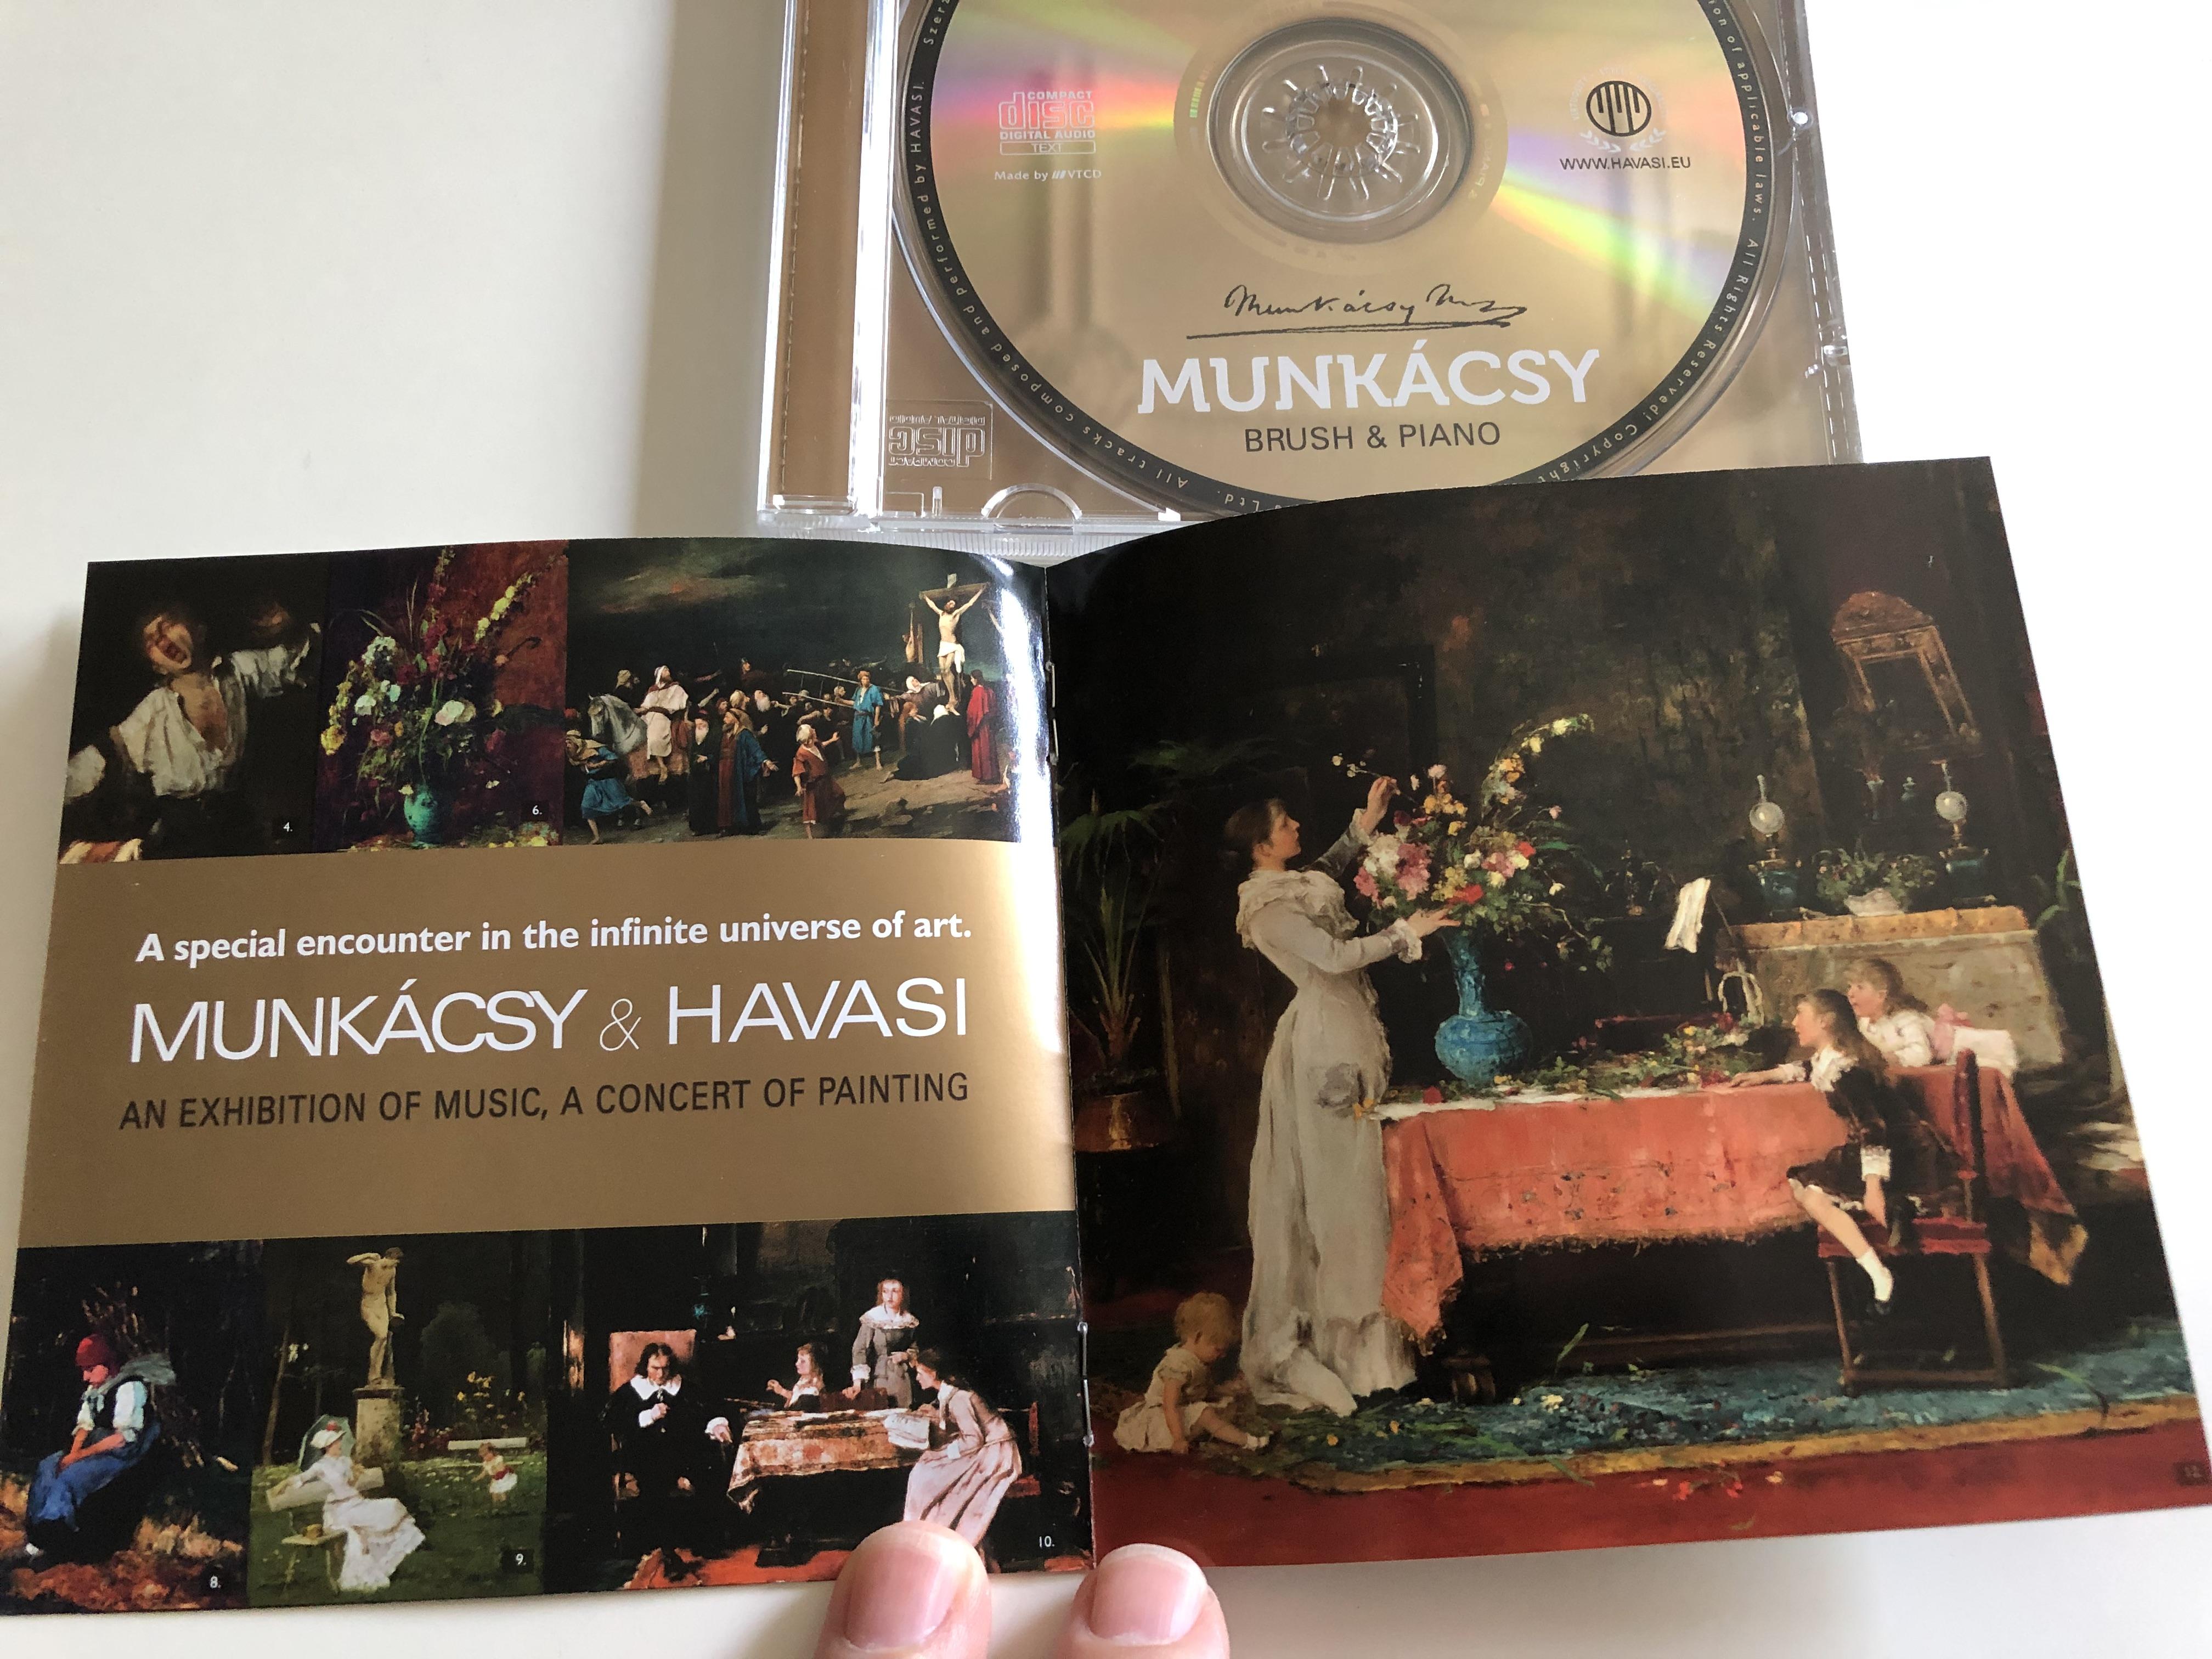 havasi-bal-zs-brush-piano-musical-tribute-to-hungarian-genius-painter-munk-csy-mih-ly-featuring-dohn-nyi-symphony-orchestra-budafok-audio-cd-2012-zenei-tisztelg-s-a-magyar-fest-g-niusz-el-tt-5-.jpg